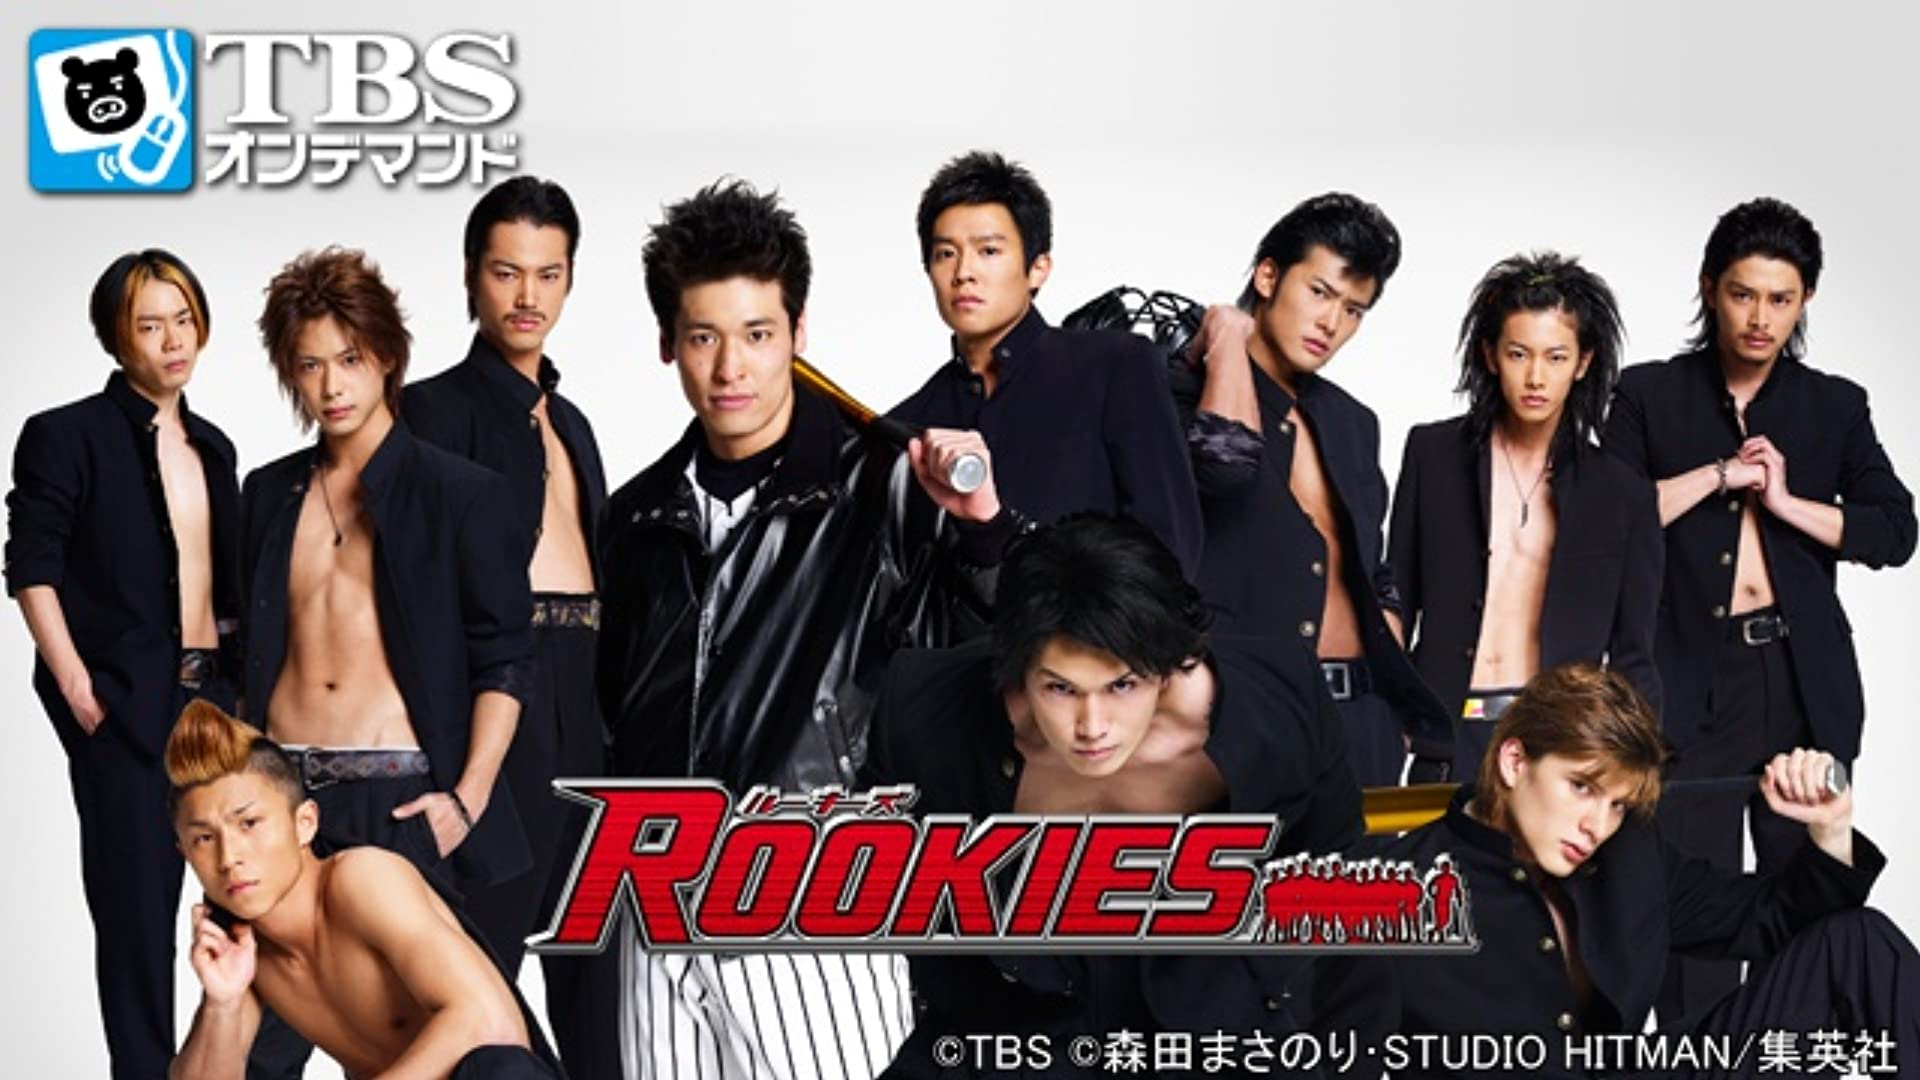 ROOKIES【TBSオンデマンド】